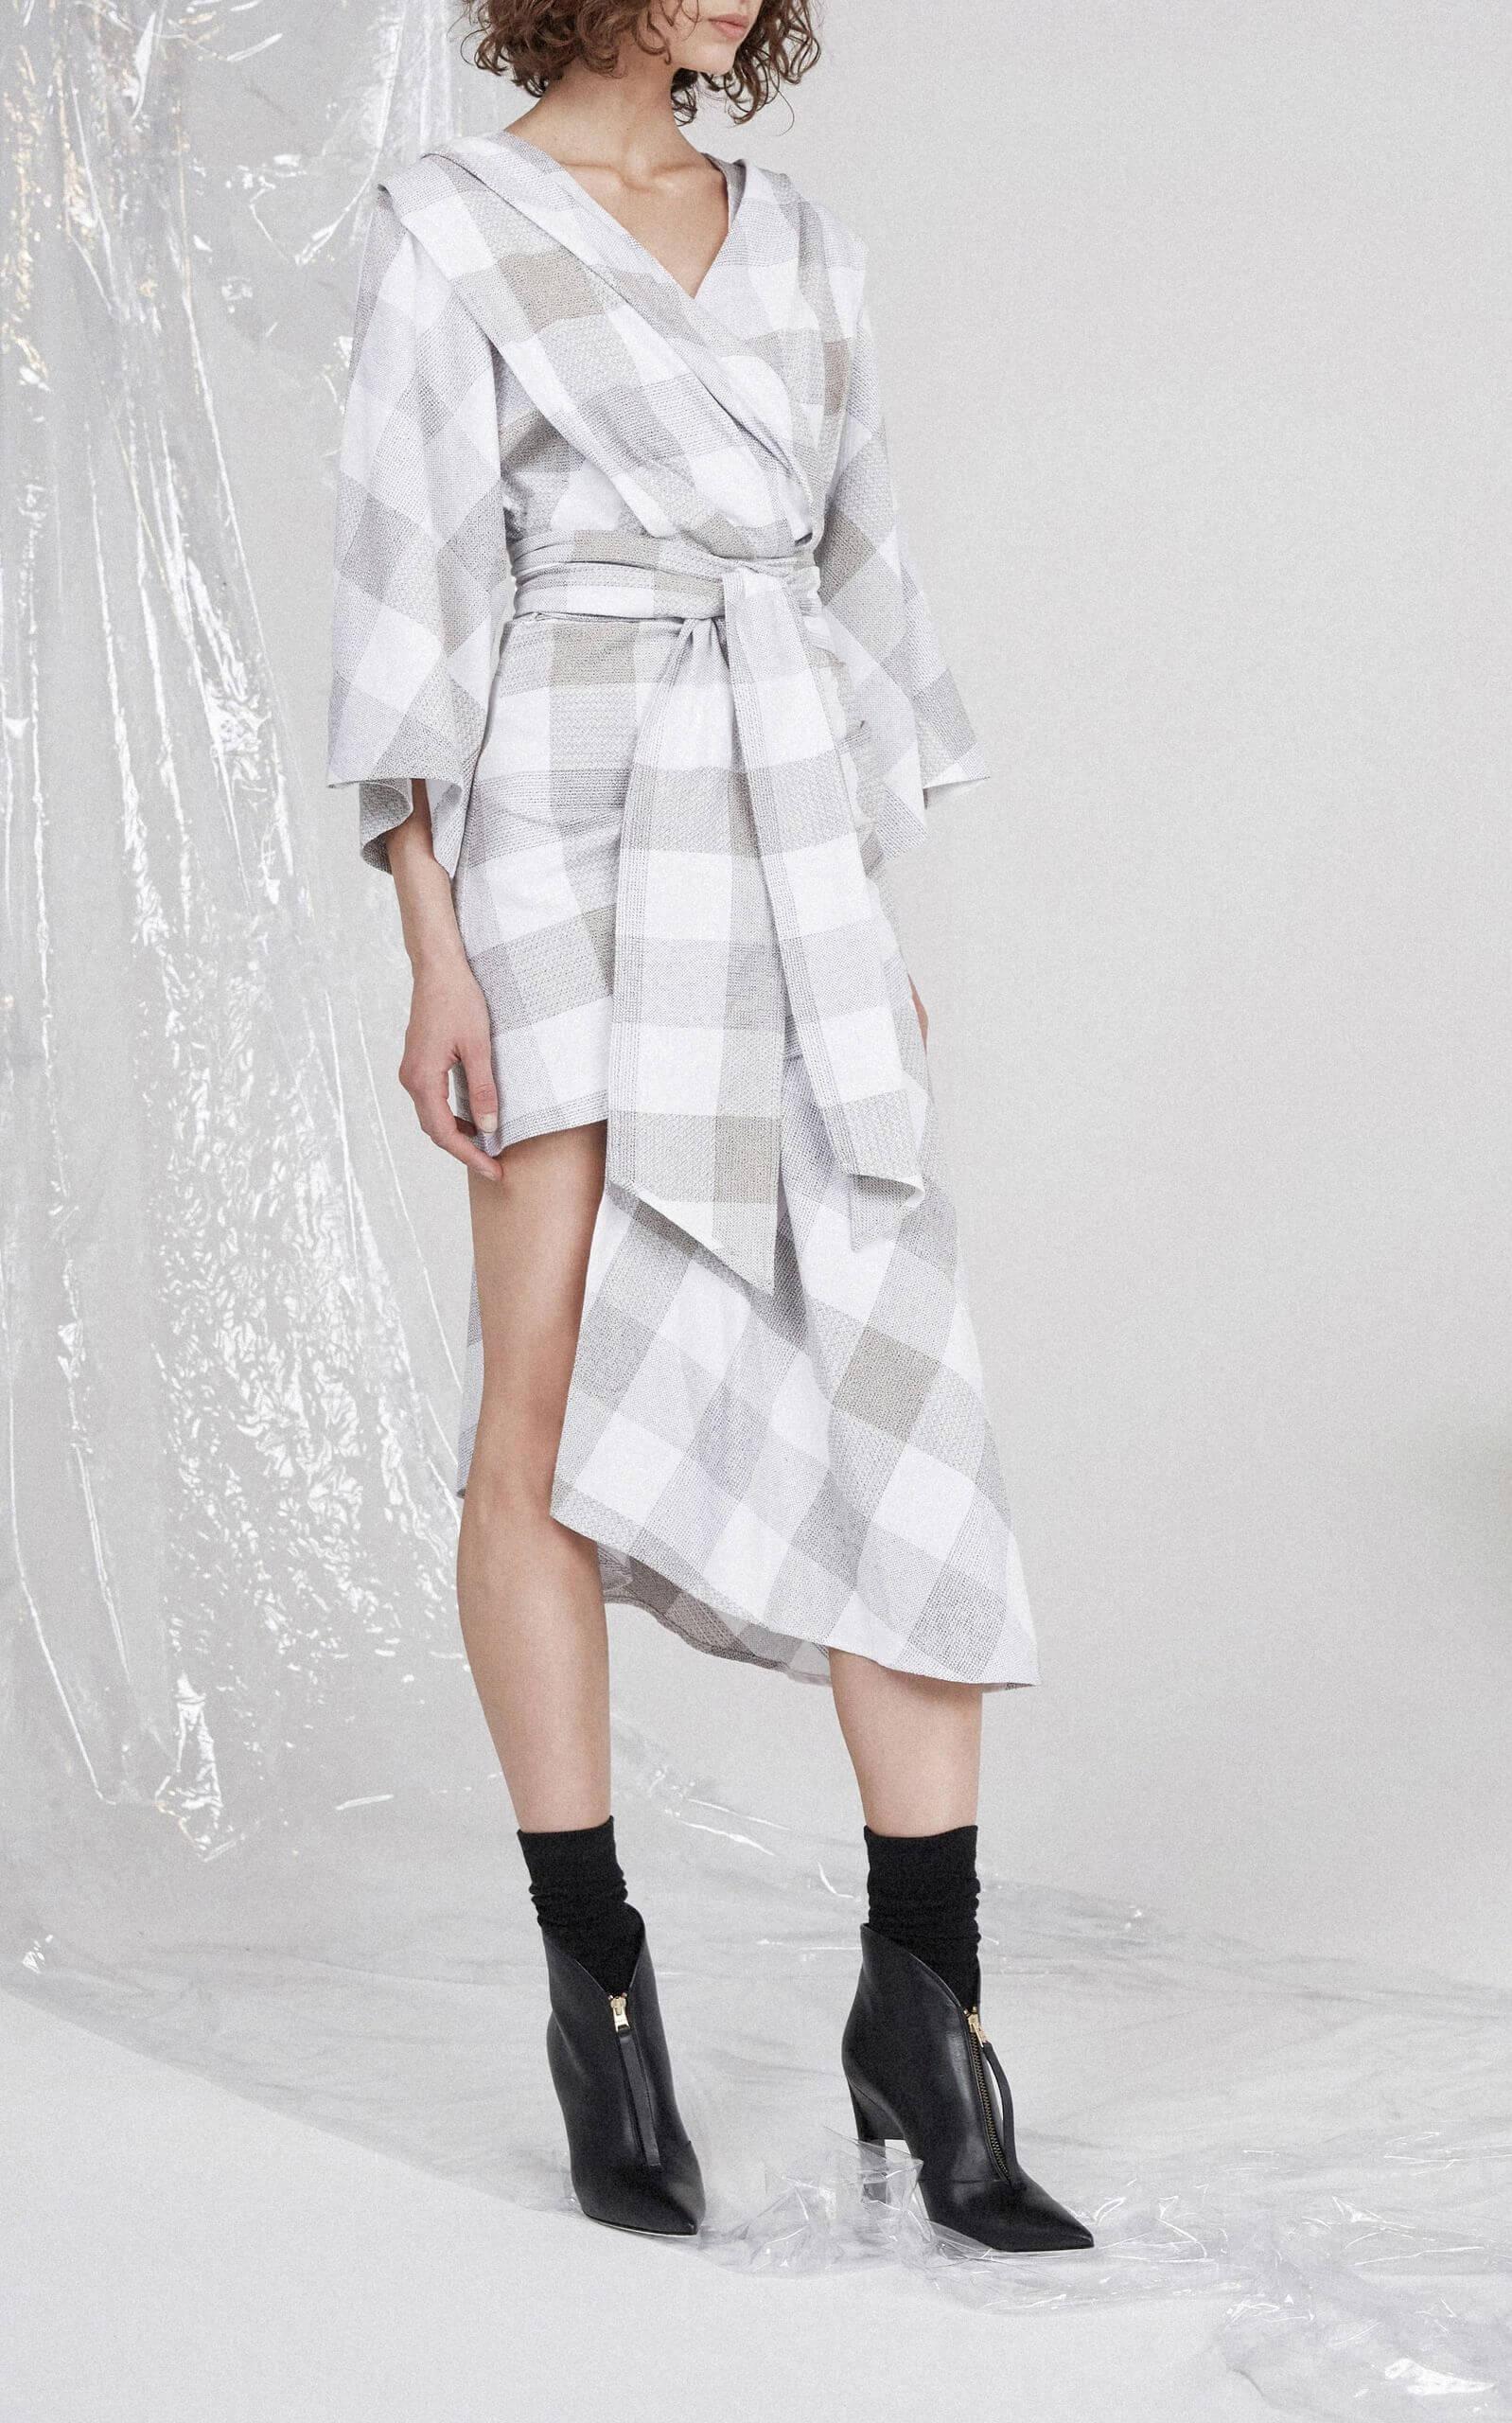 Whitland Dress